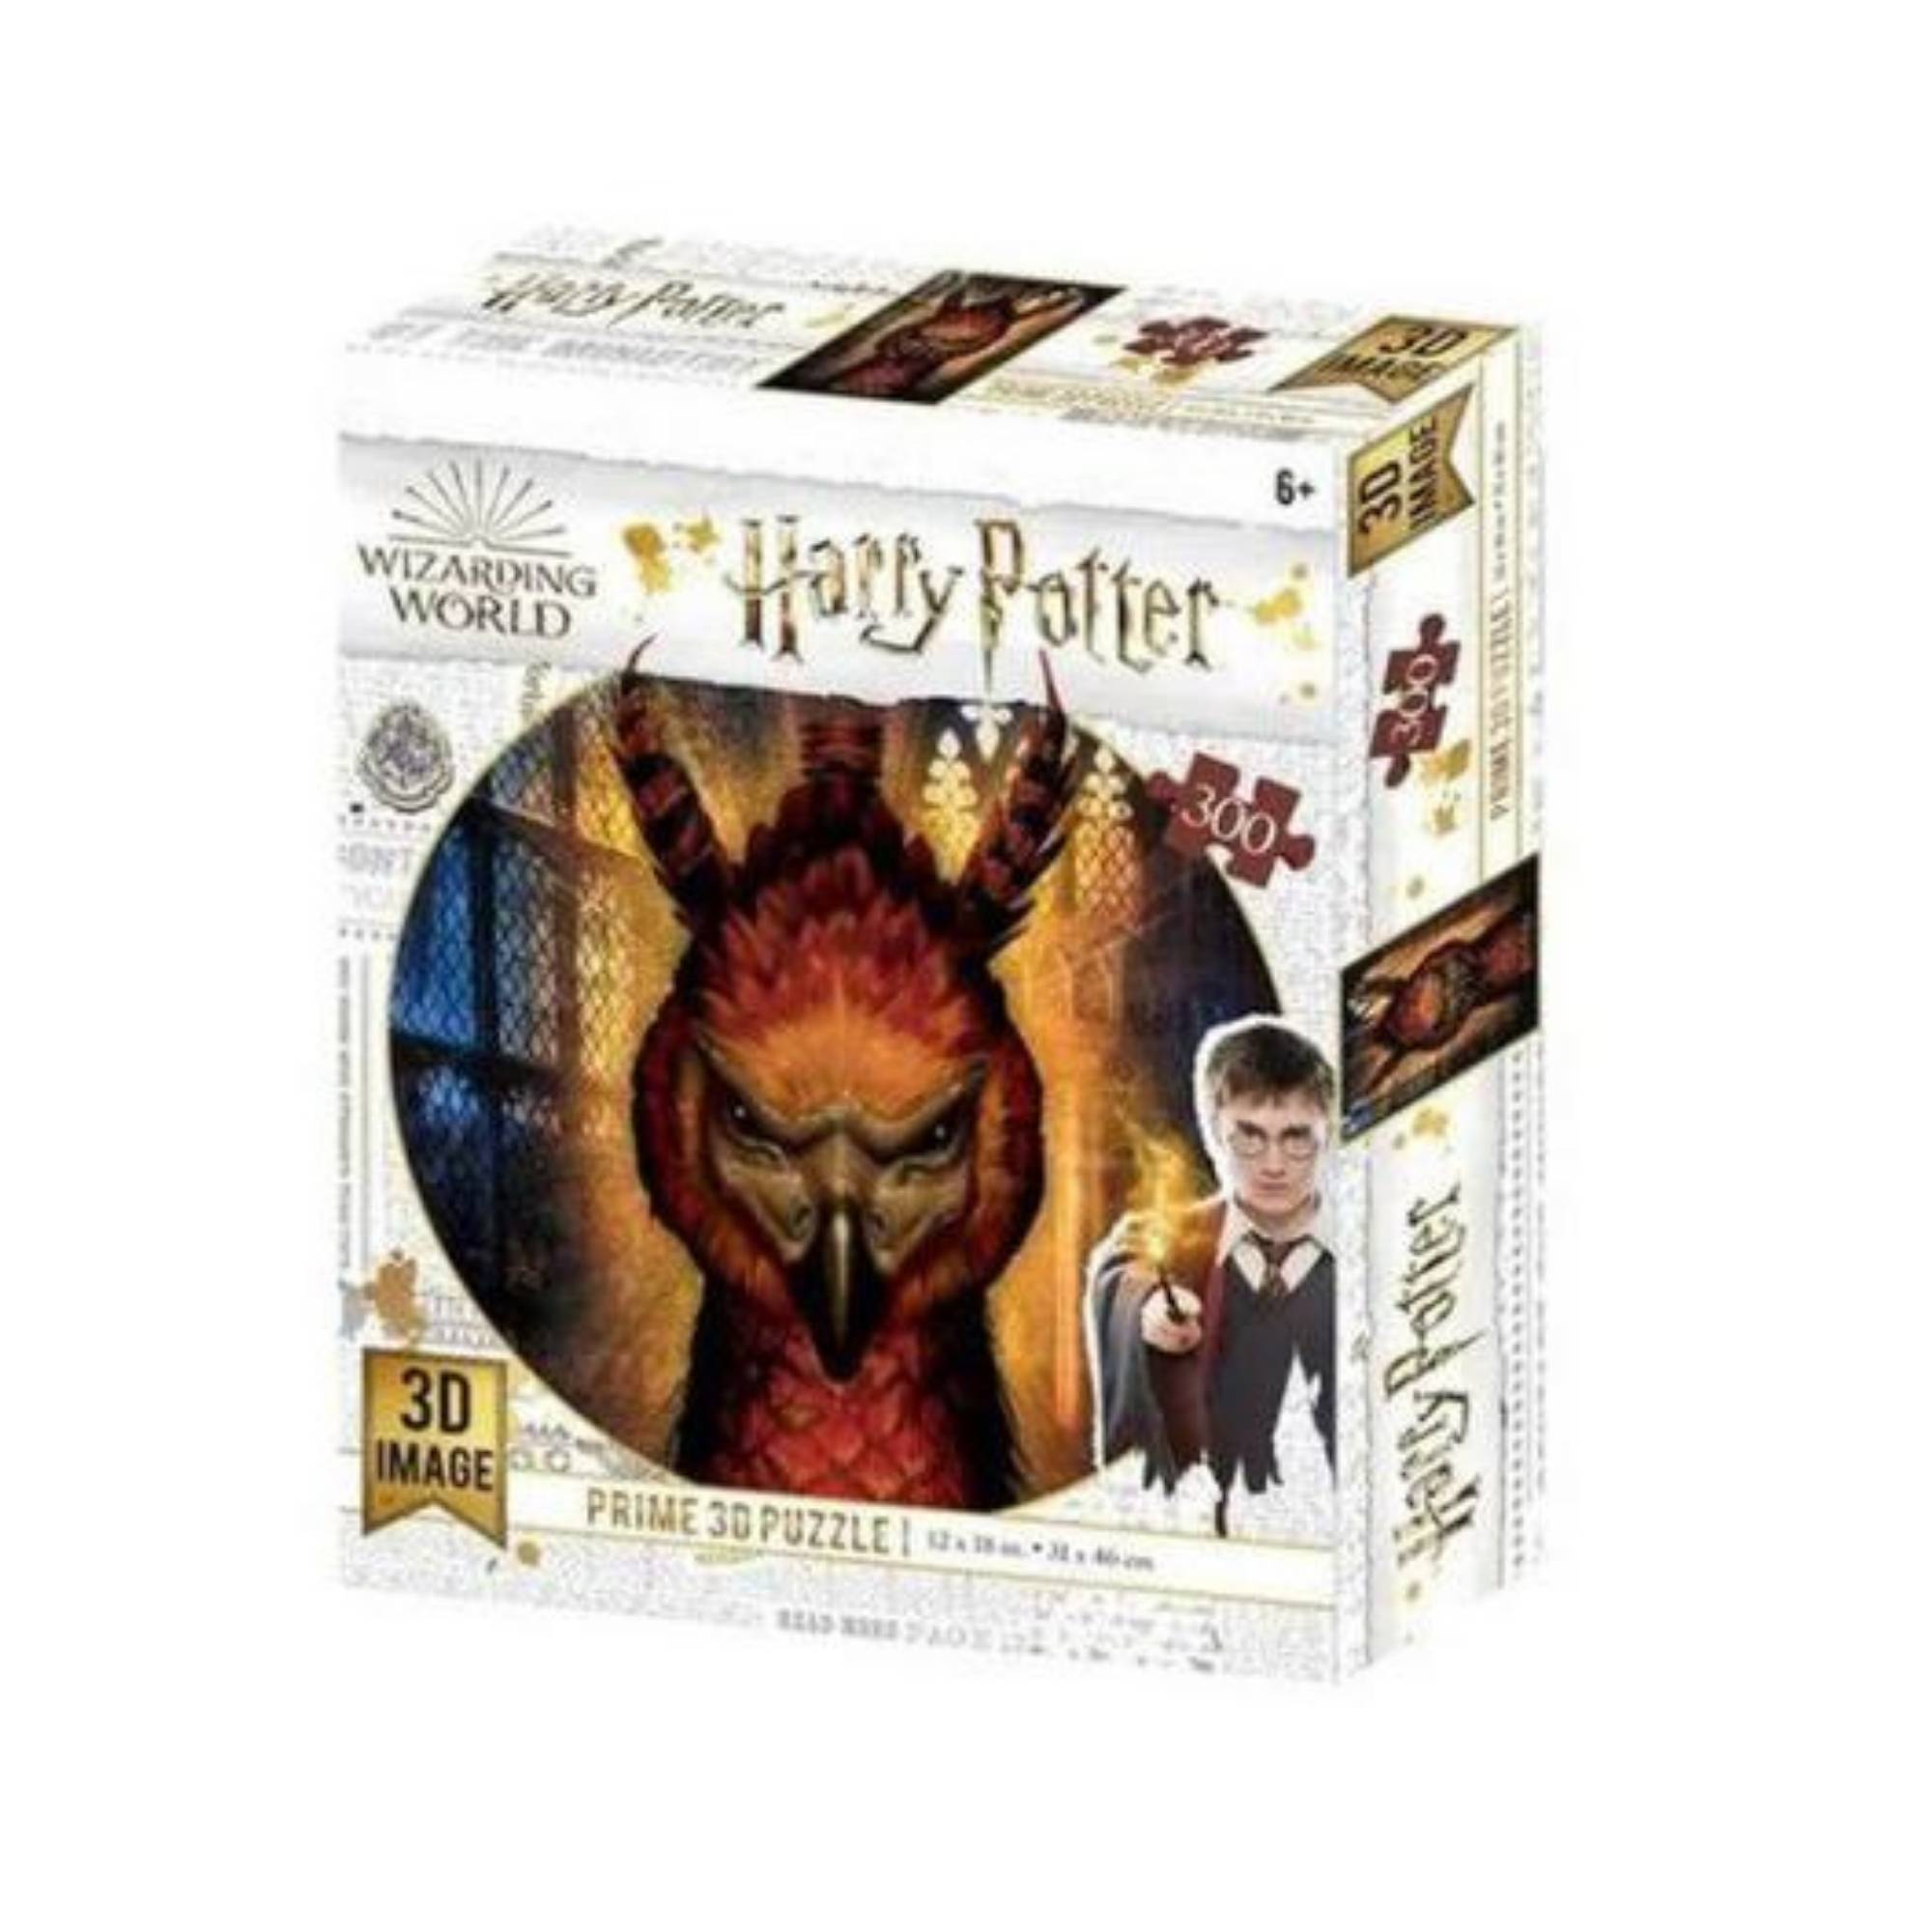 Quebra-cabeça Holográfico Fênix Harry Potter 300 Peças - Multikids